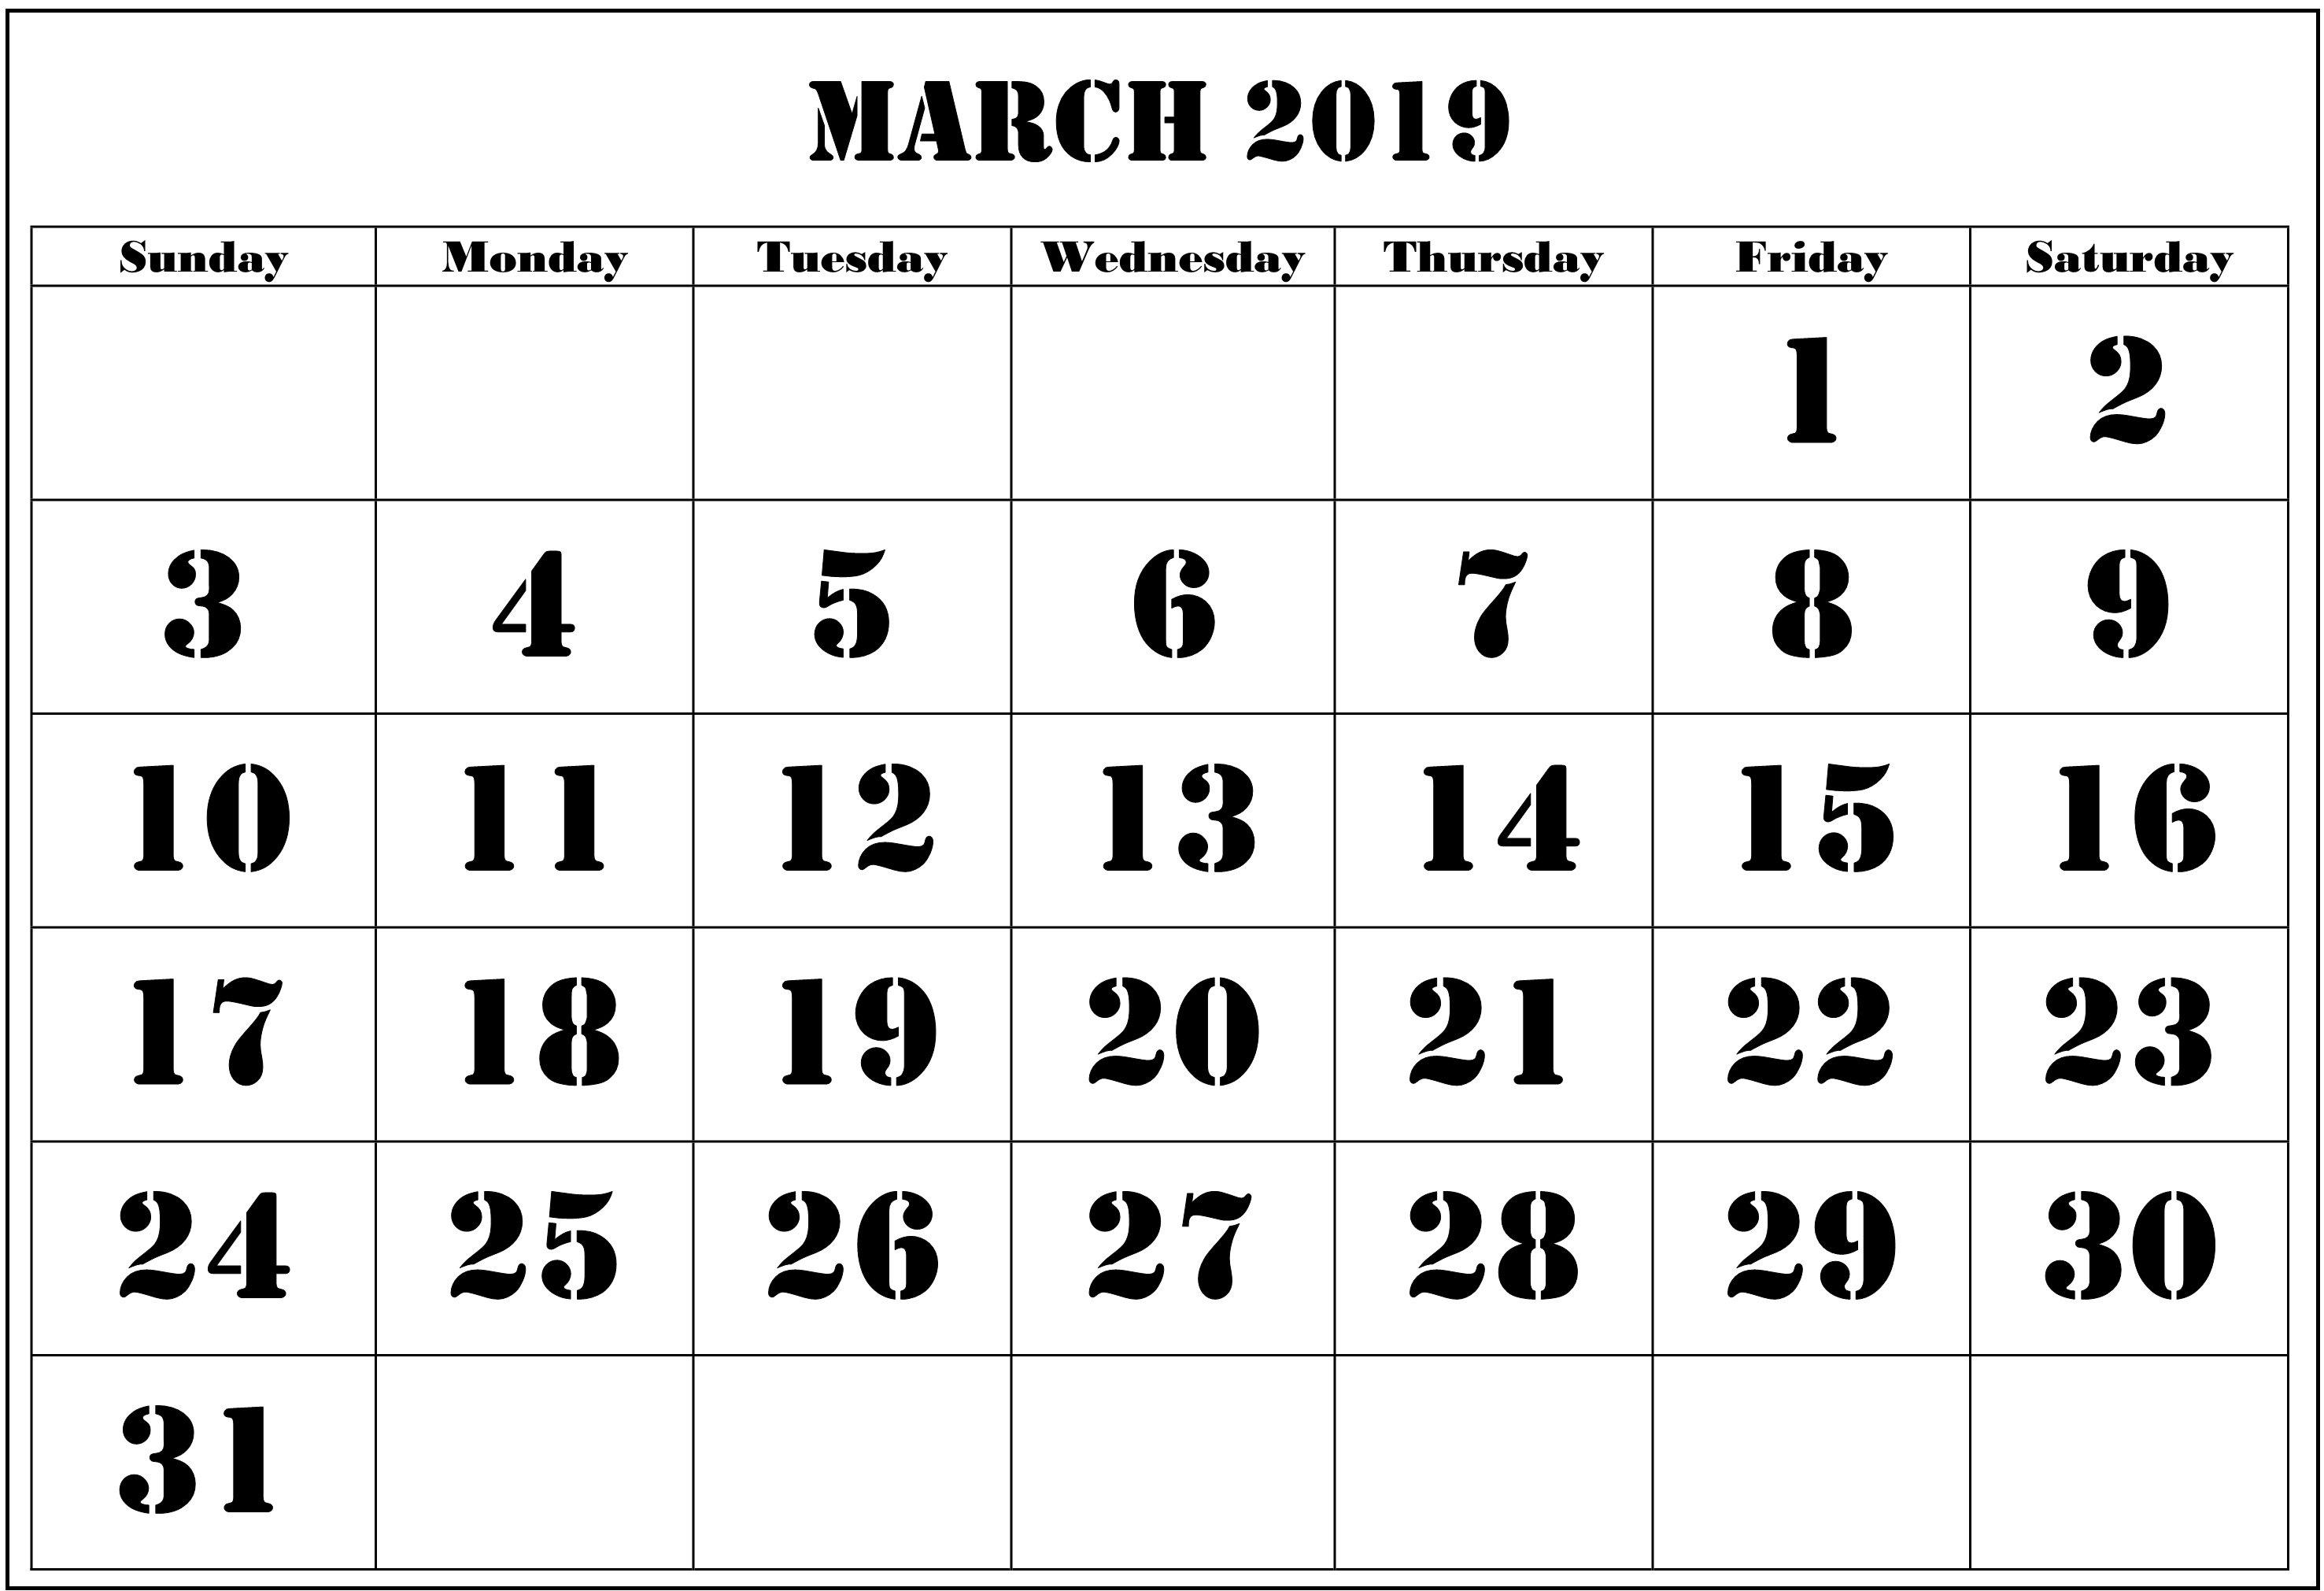 Blank Calendar March 2019 – Free August 2019 Calendar Printable March 8 2019 Calendar